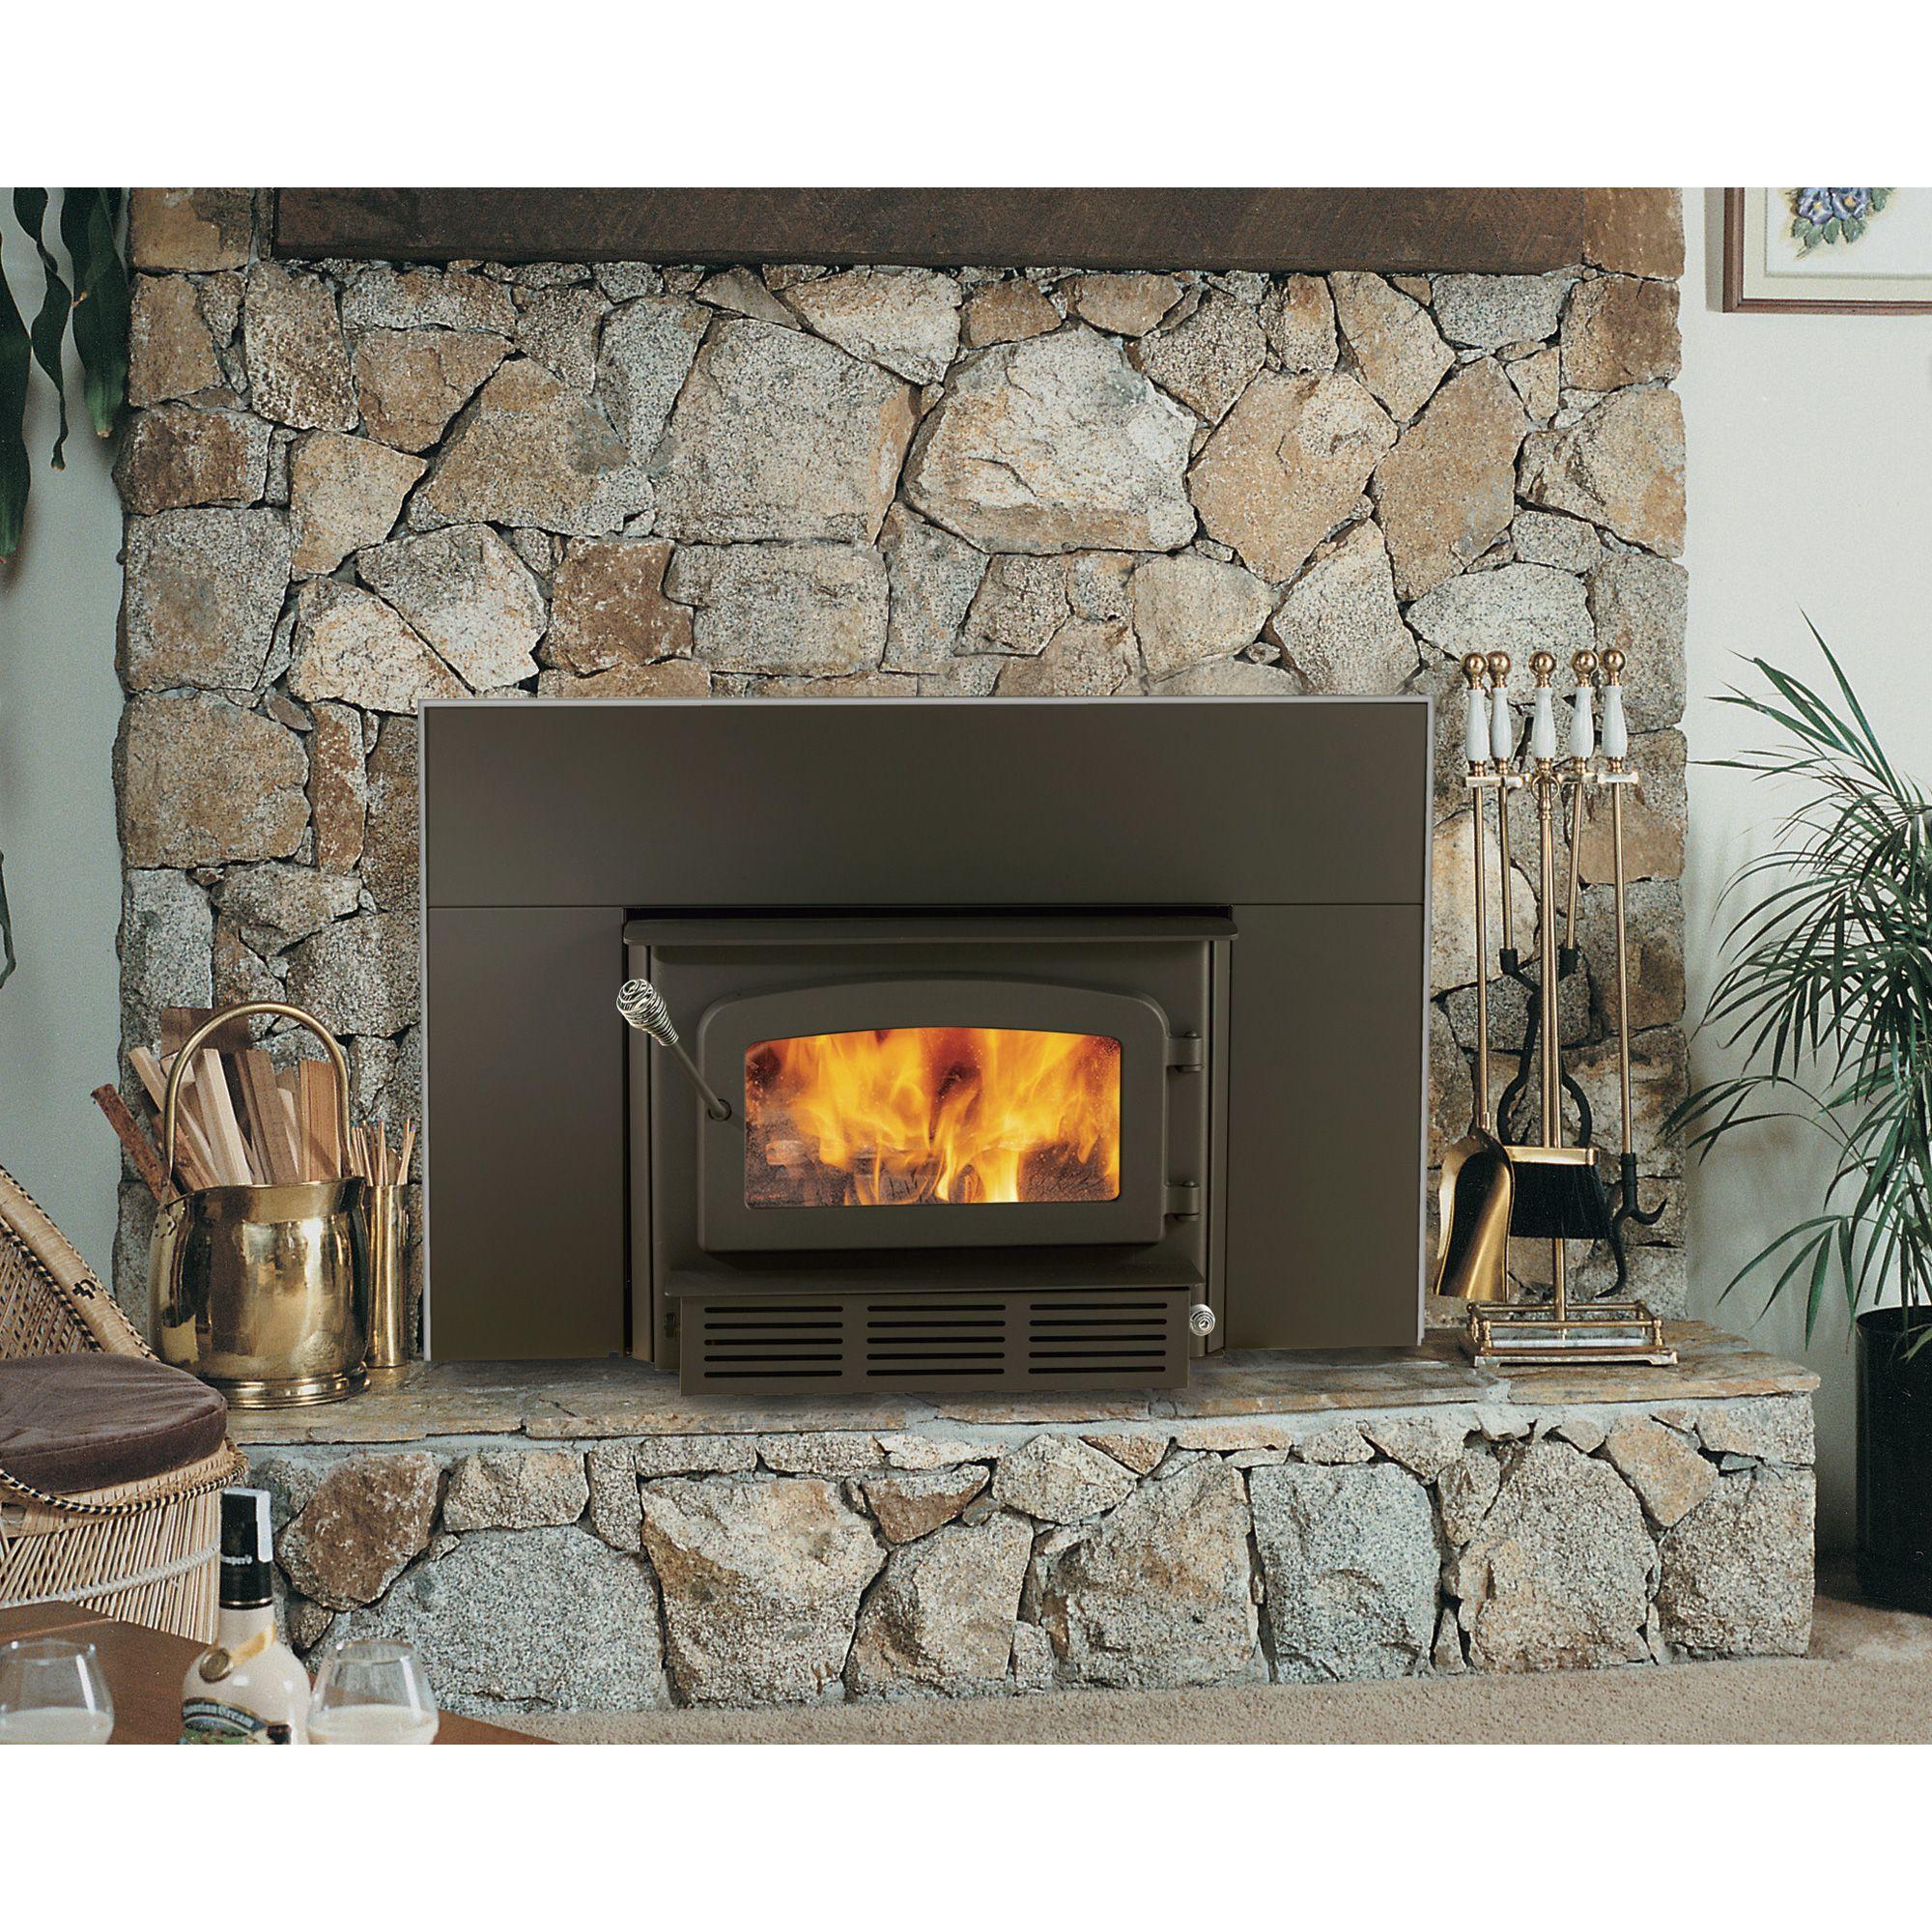 Drolet High Efficiency Escape Fireplace Wood Insert 60 000 Btu Epa Certified Model Db03122 Wood Stoves Fireplace House Styles Wood Stove Fireplace